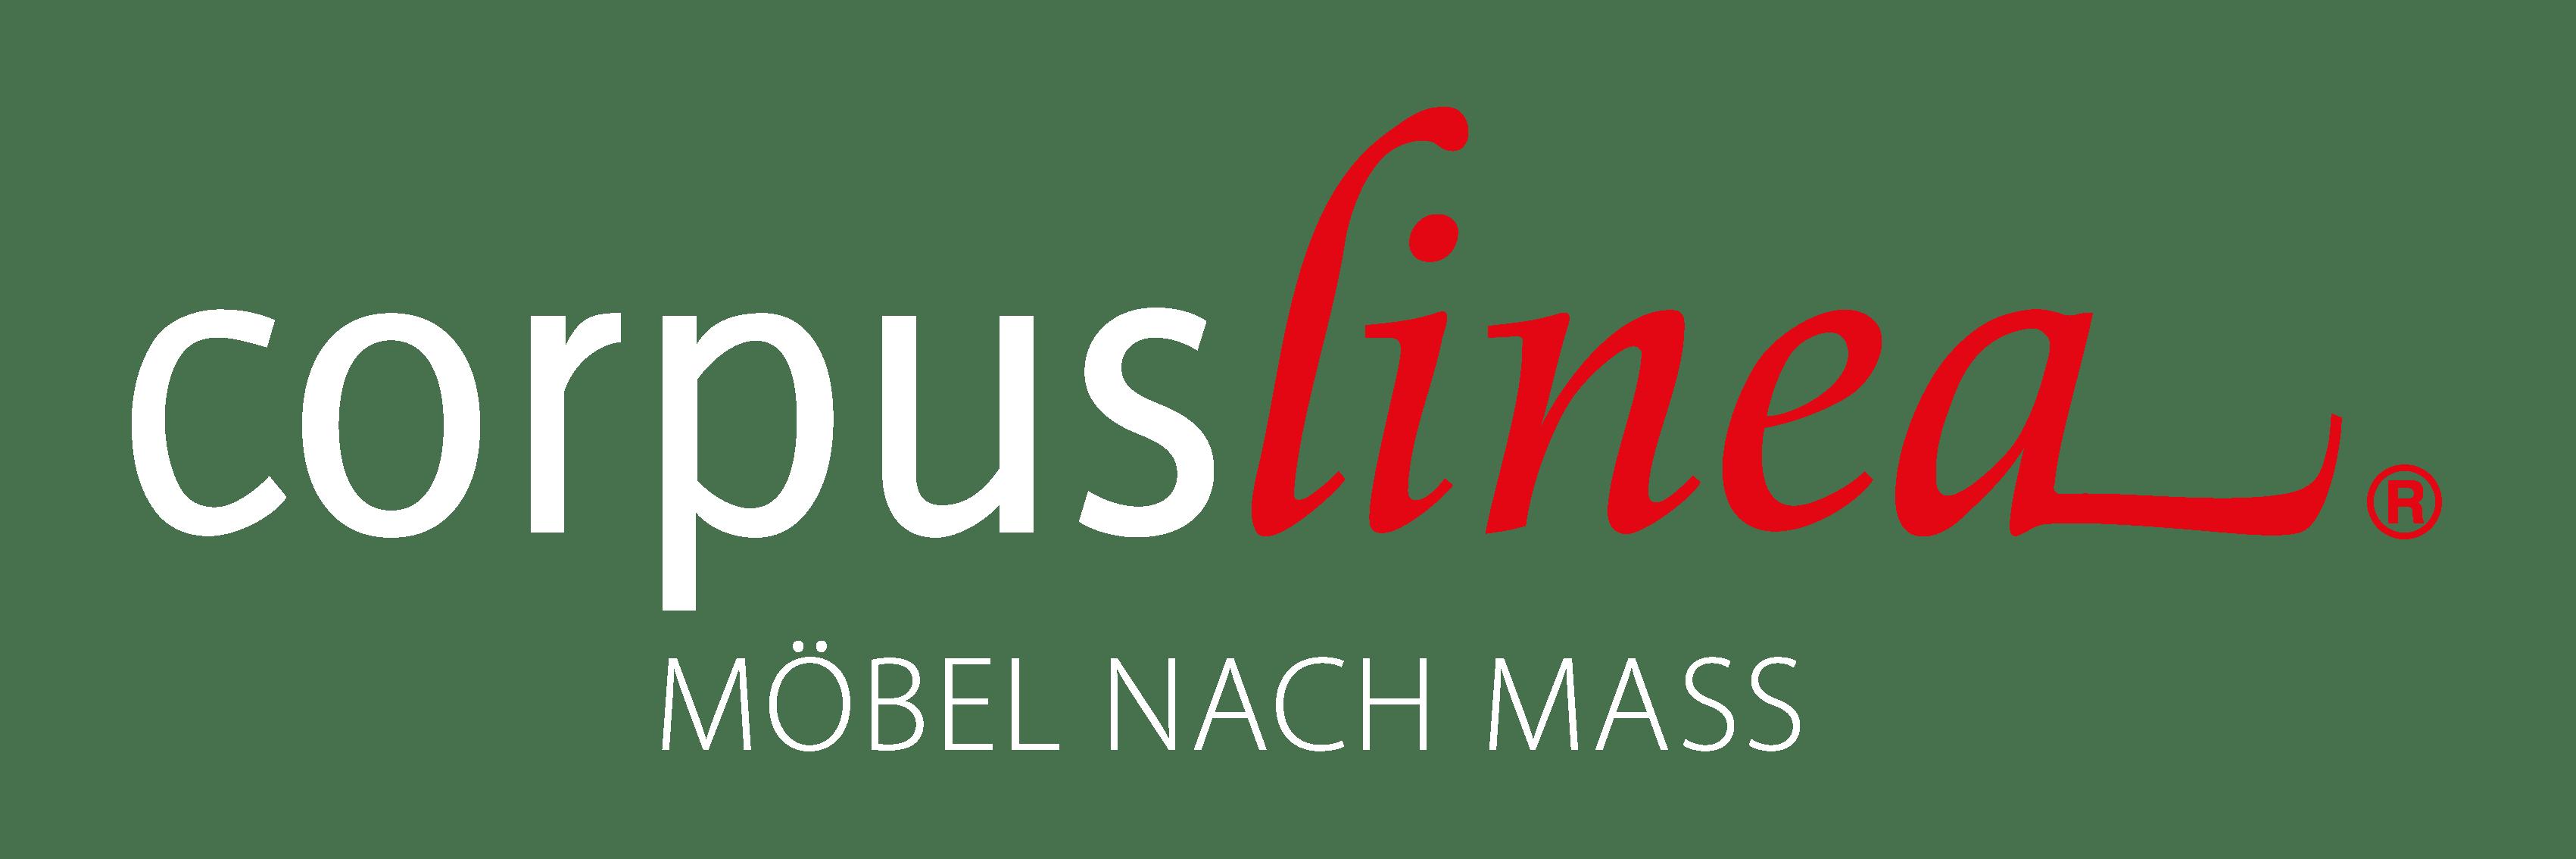 corpuslinea - Möbel nach Maß in Berlin